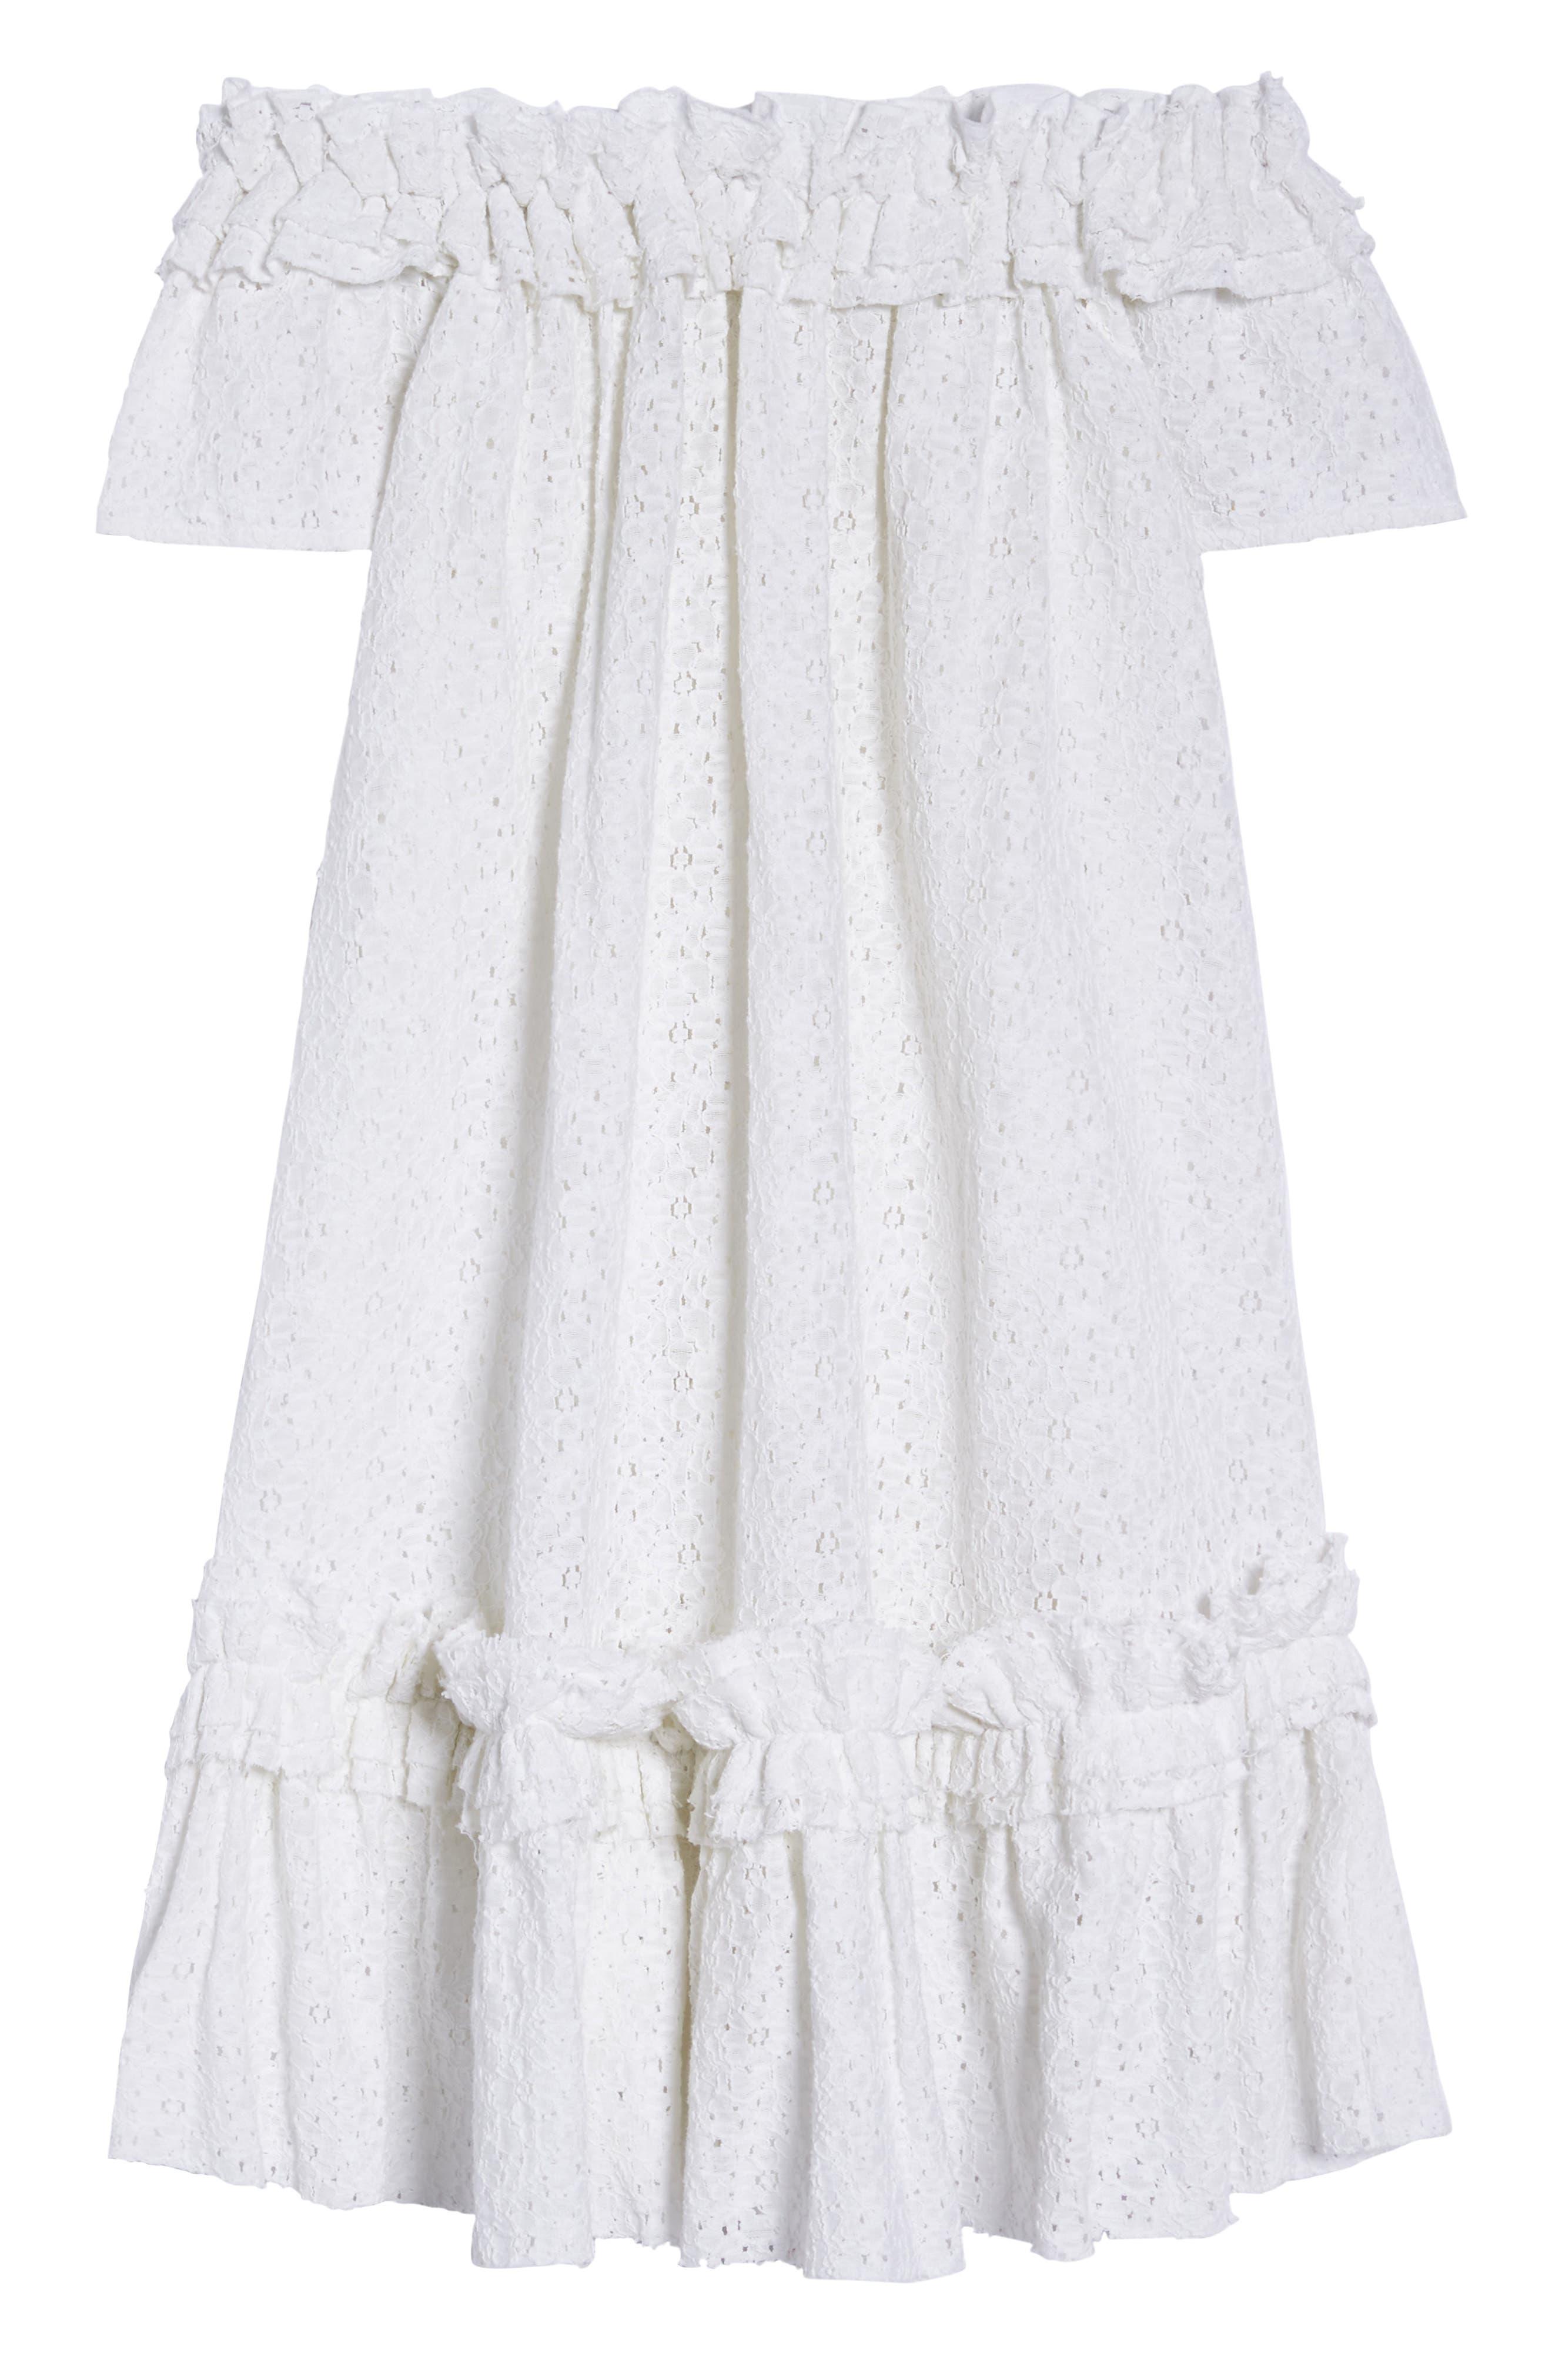 Mojito Cover-Up Dress,                             Alternate thumbnail 6, color,                             100